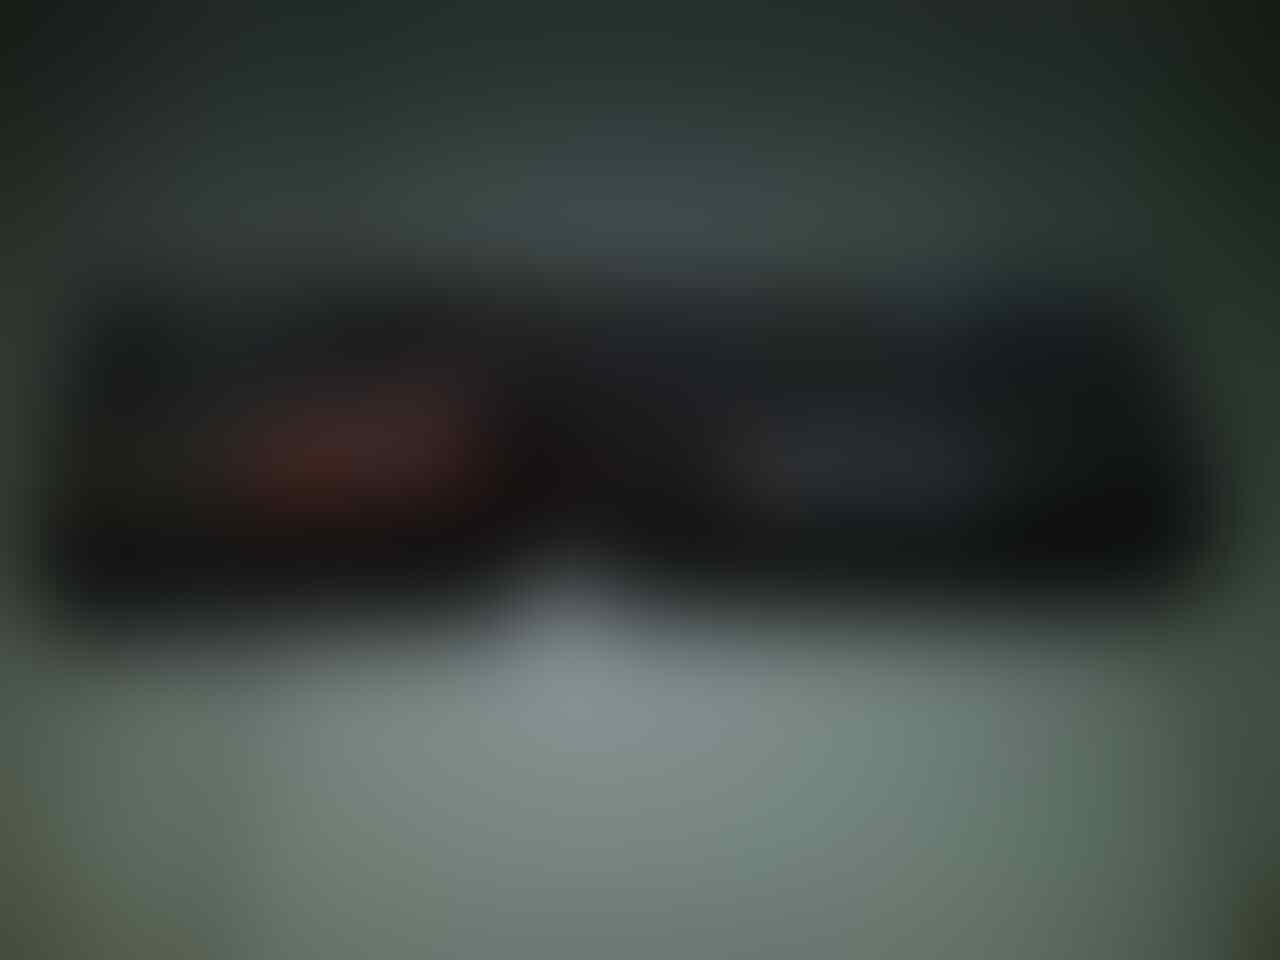 Jual Brand New Bracket LCD TV 23 - 42 inchi